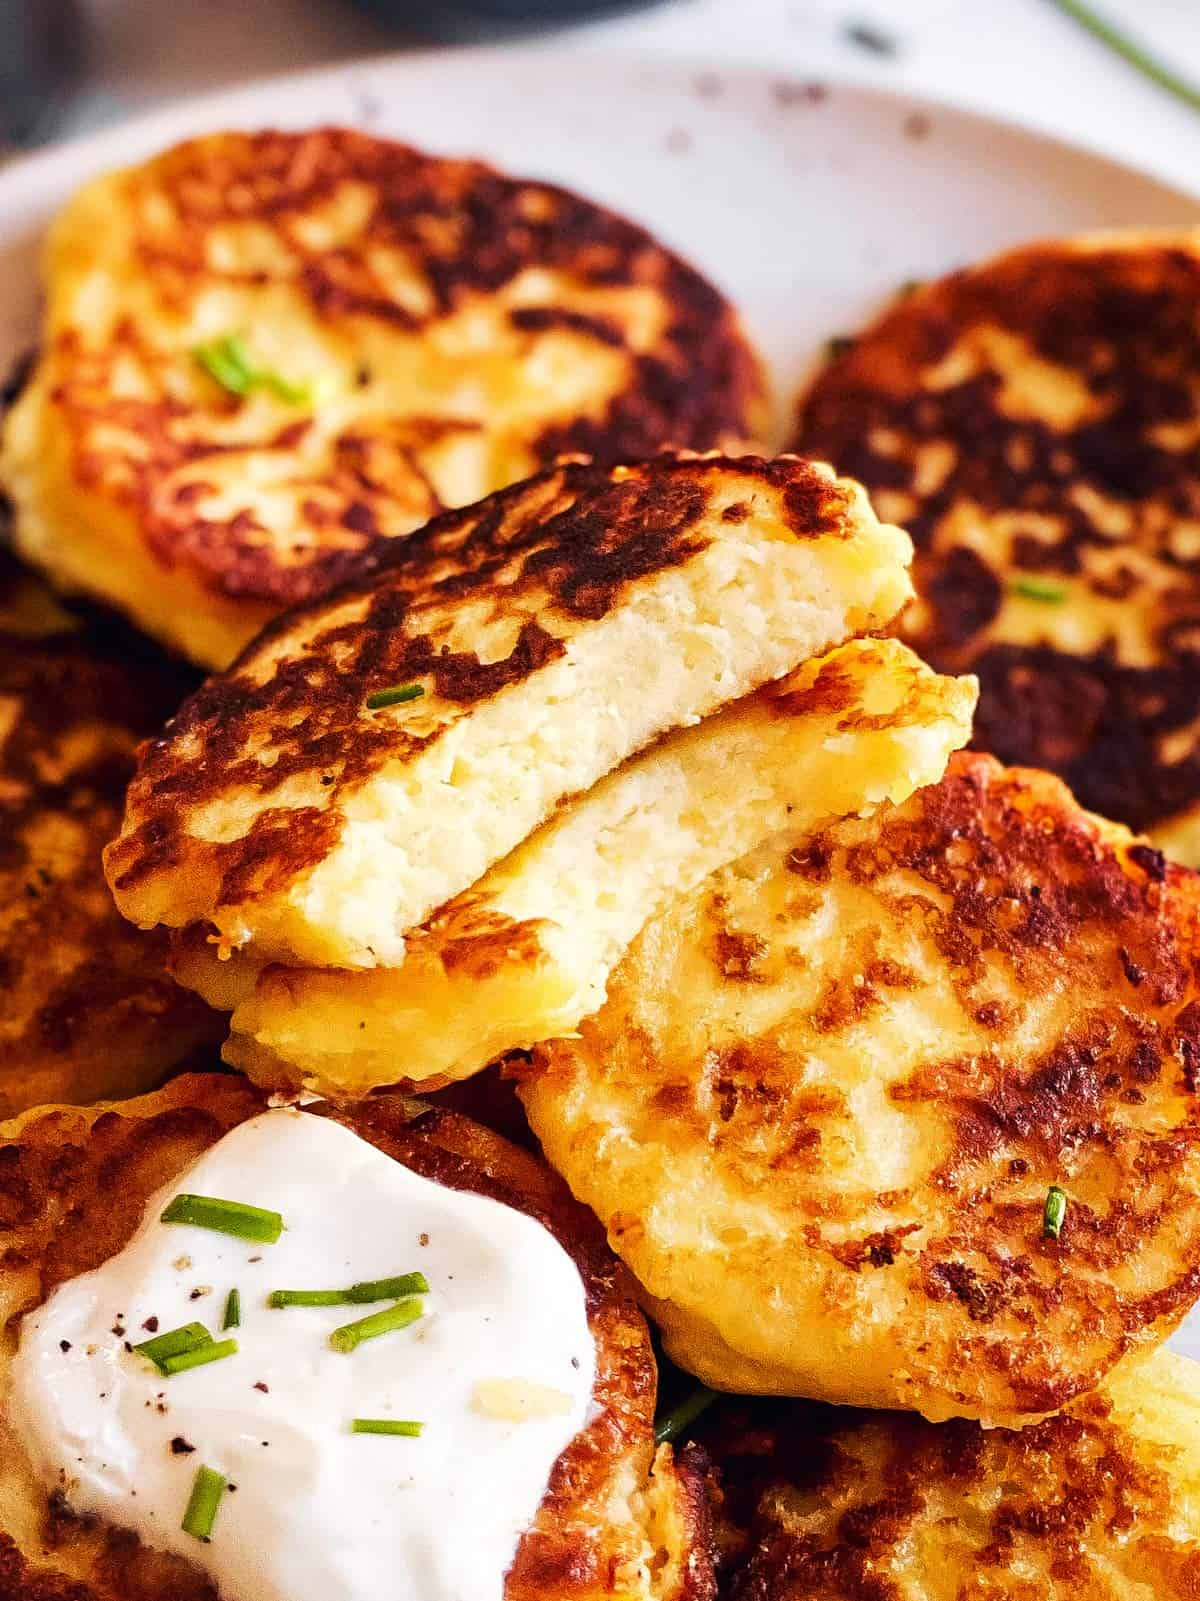 close up of halved potato pancake